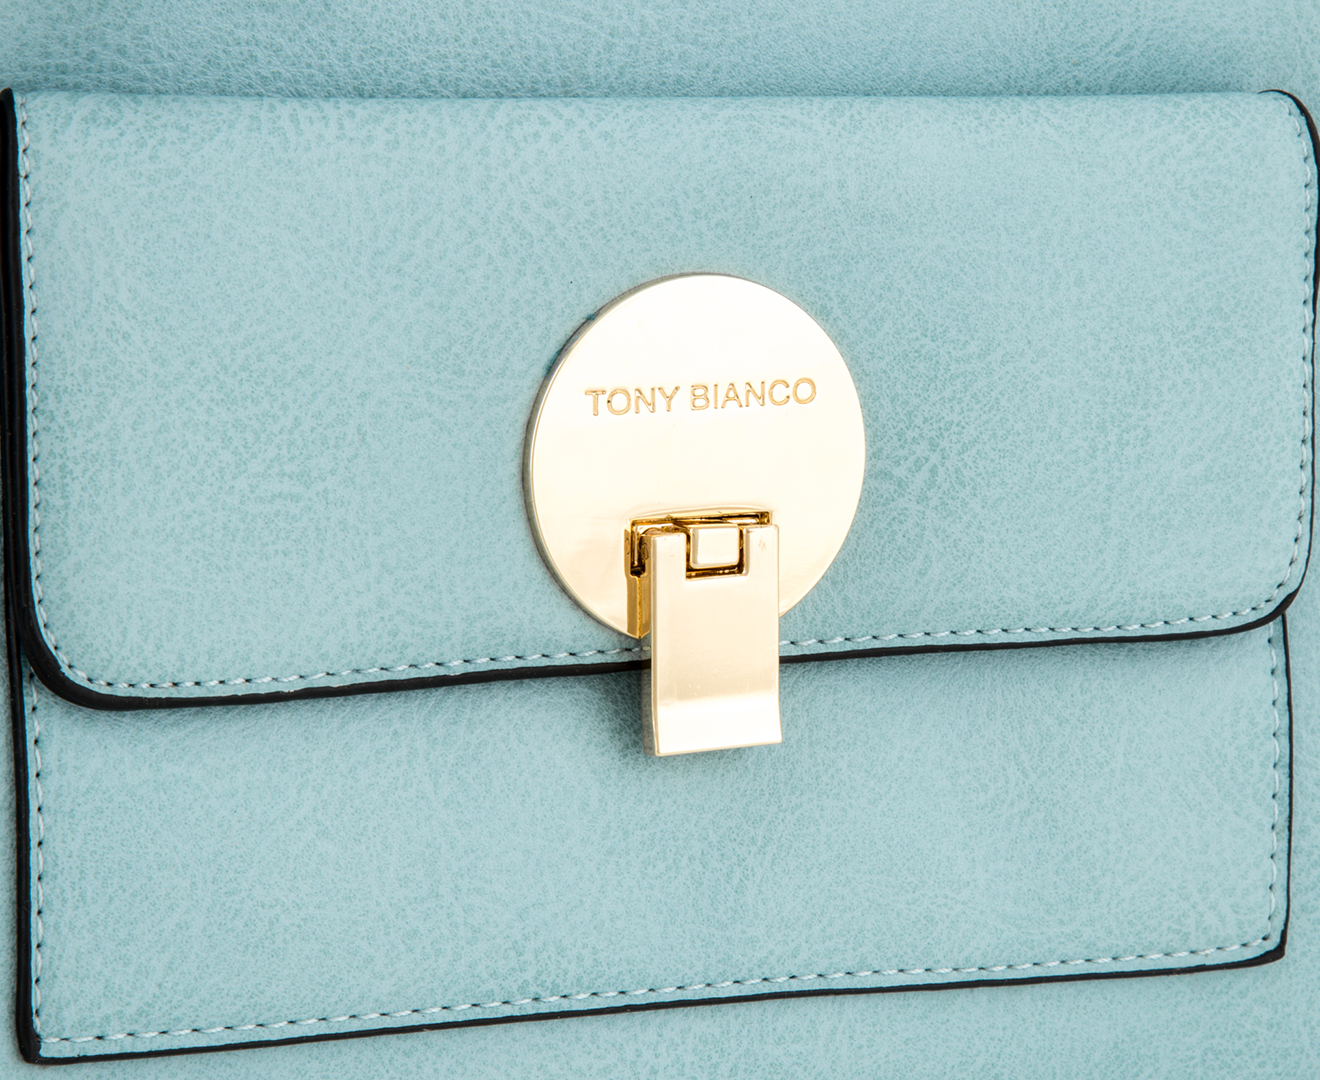 Tony Bianco Congo Clutch - Blue   Catch.com.au